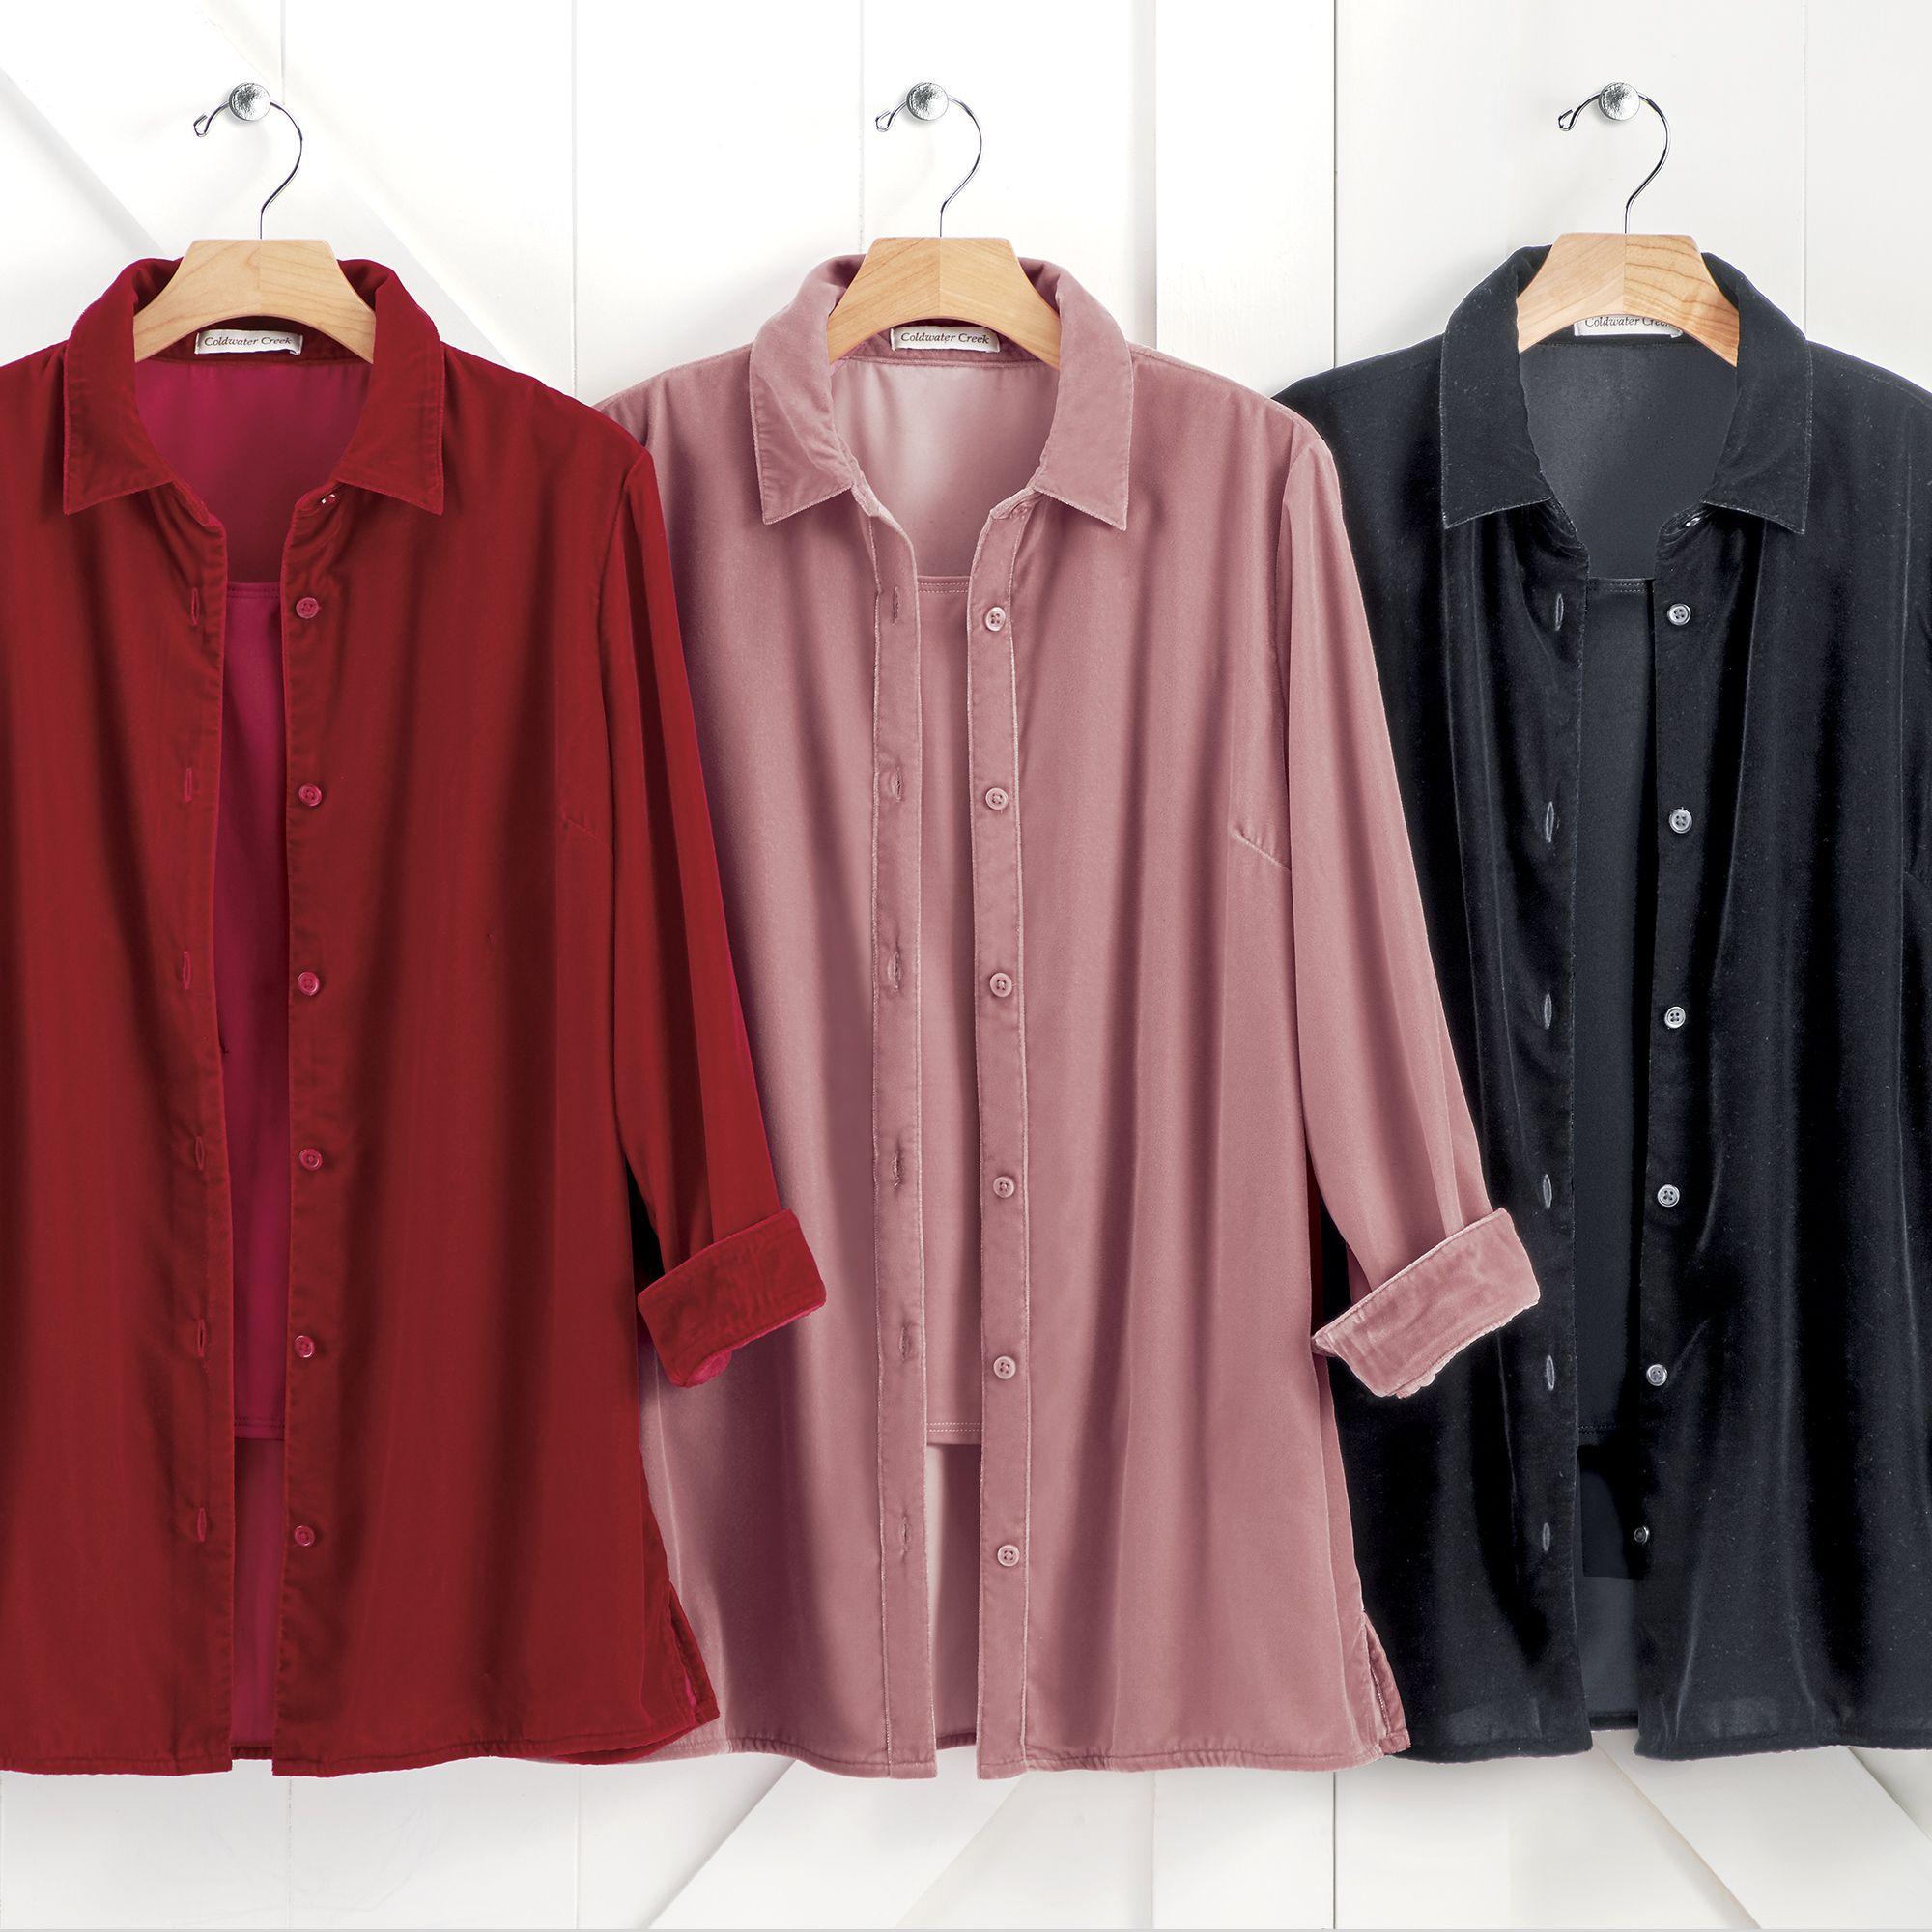 Velvet Big Shirt Casual Tunics Big Shirt Shirt Blouses